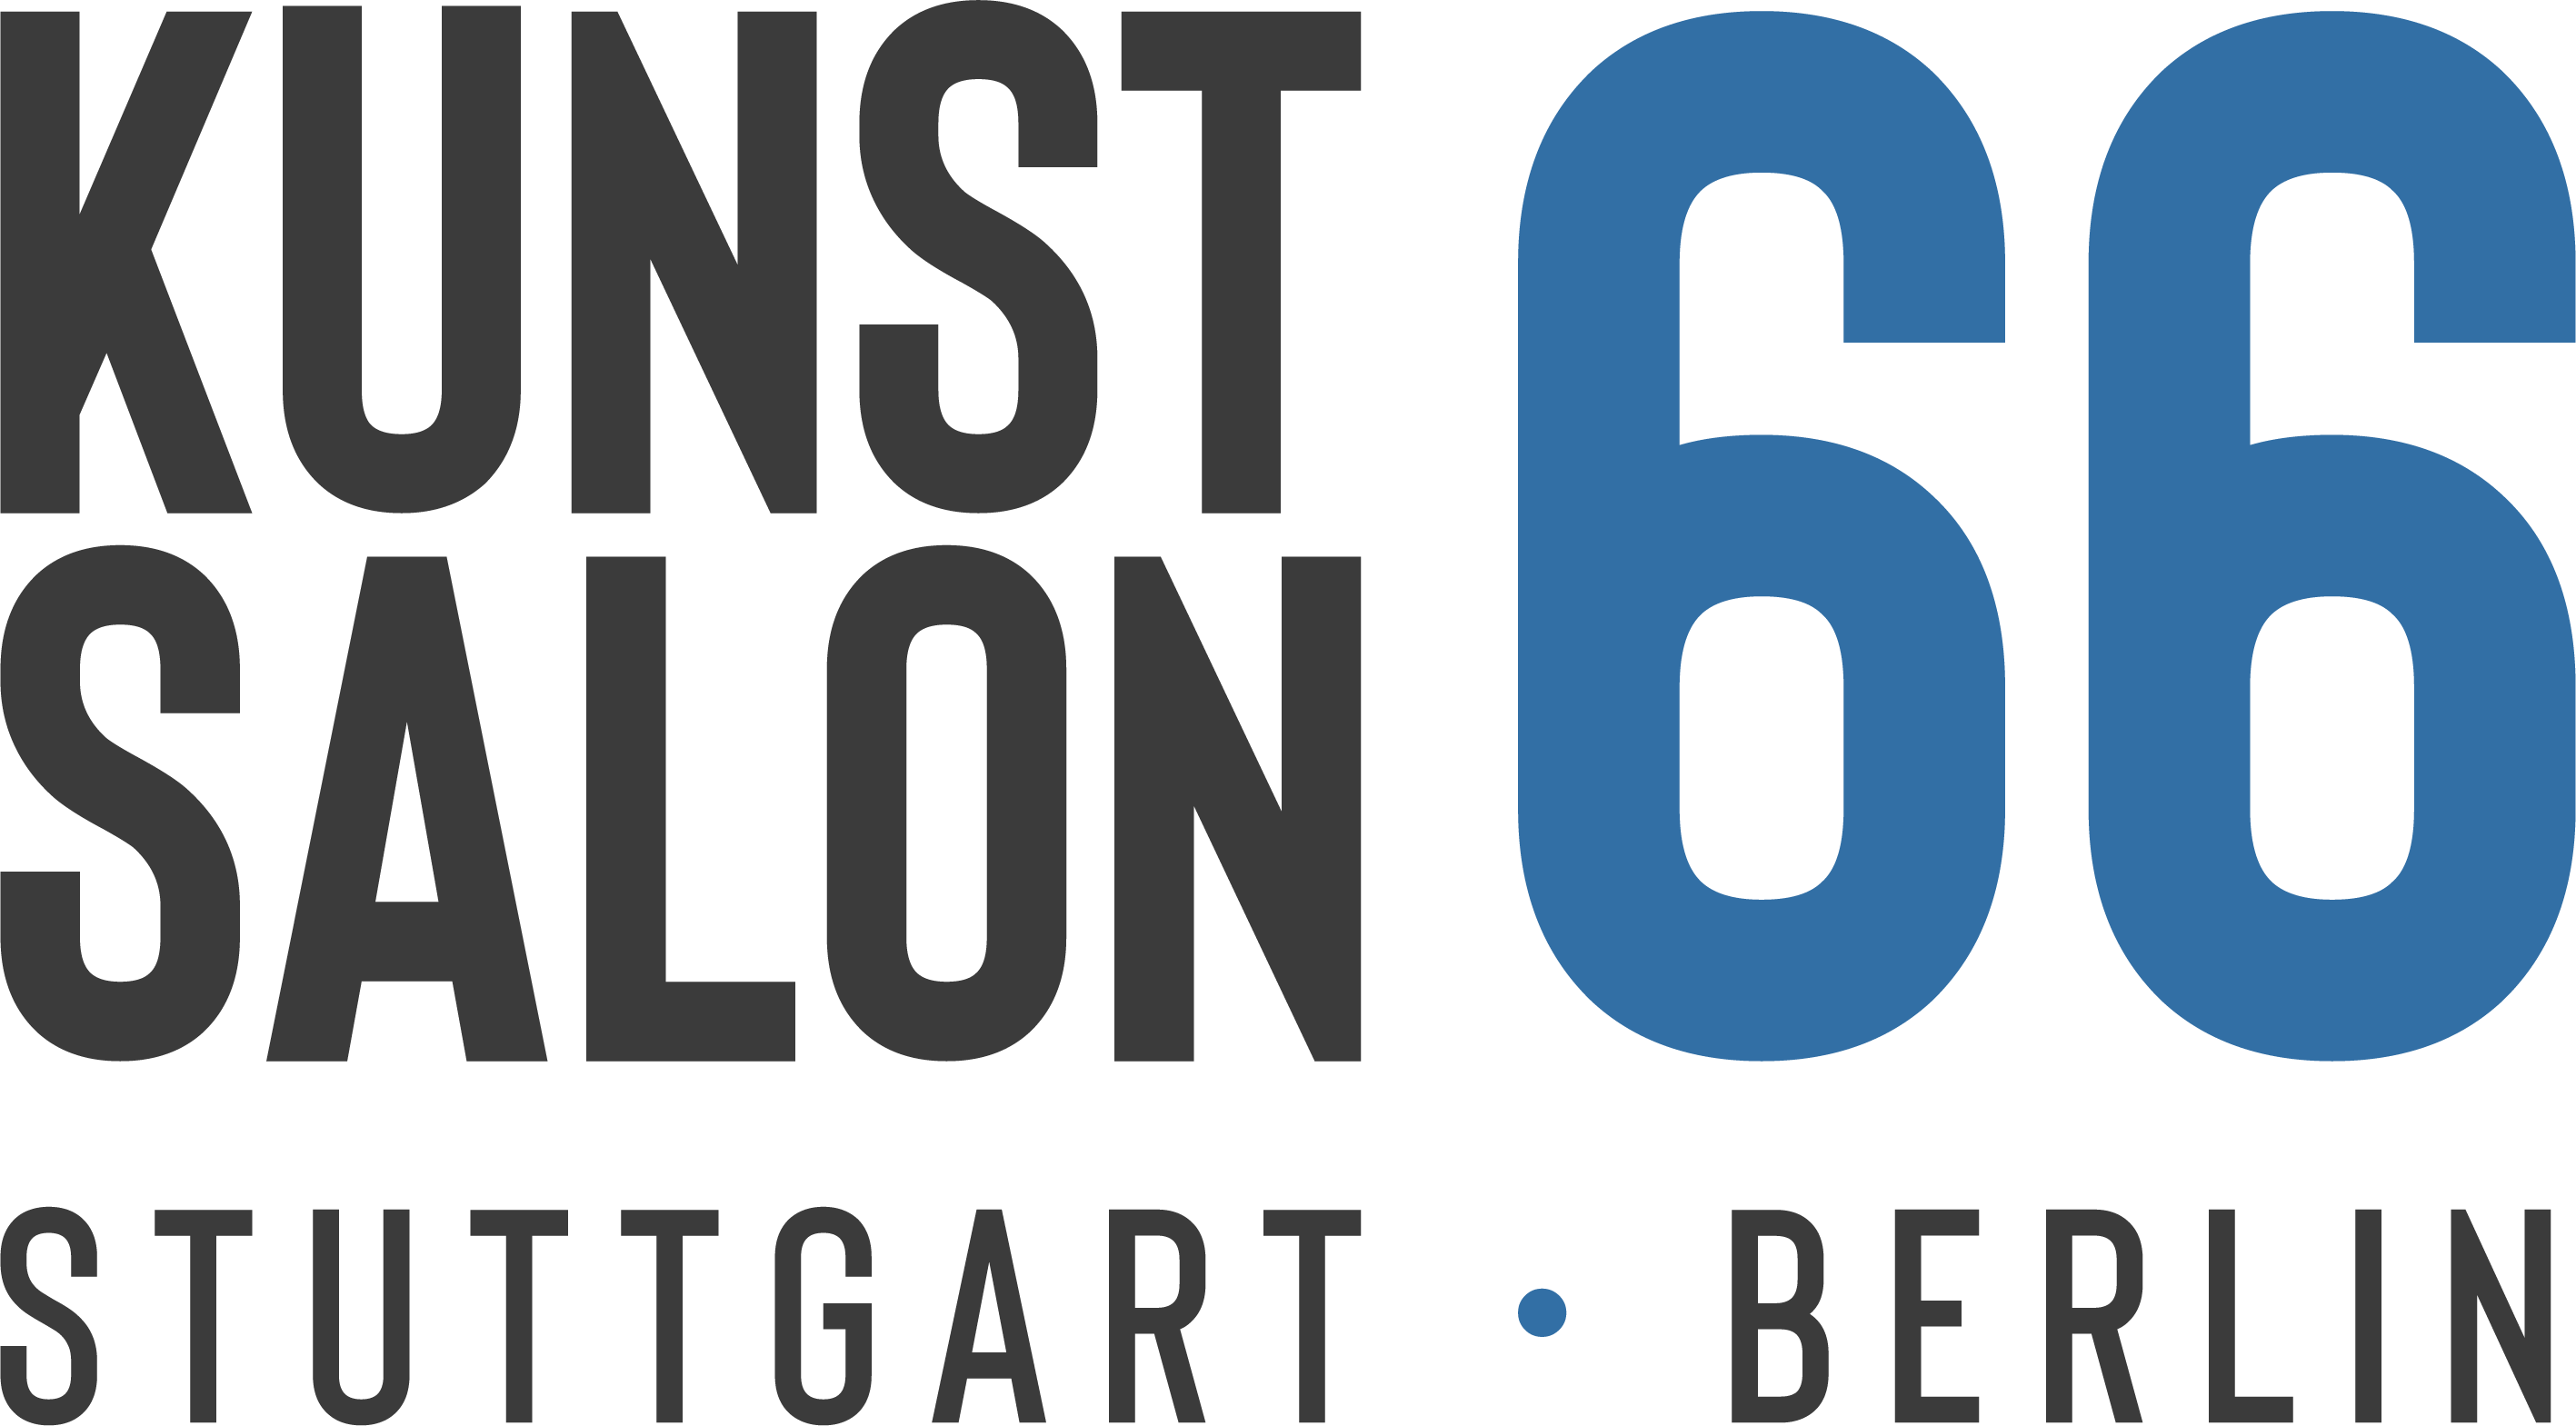 Kunstsalon66